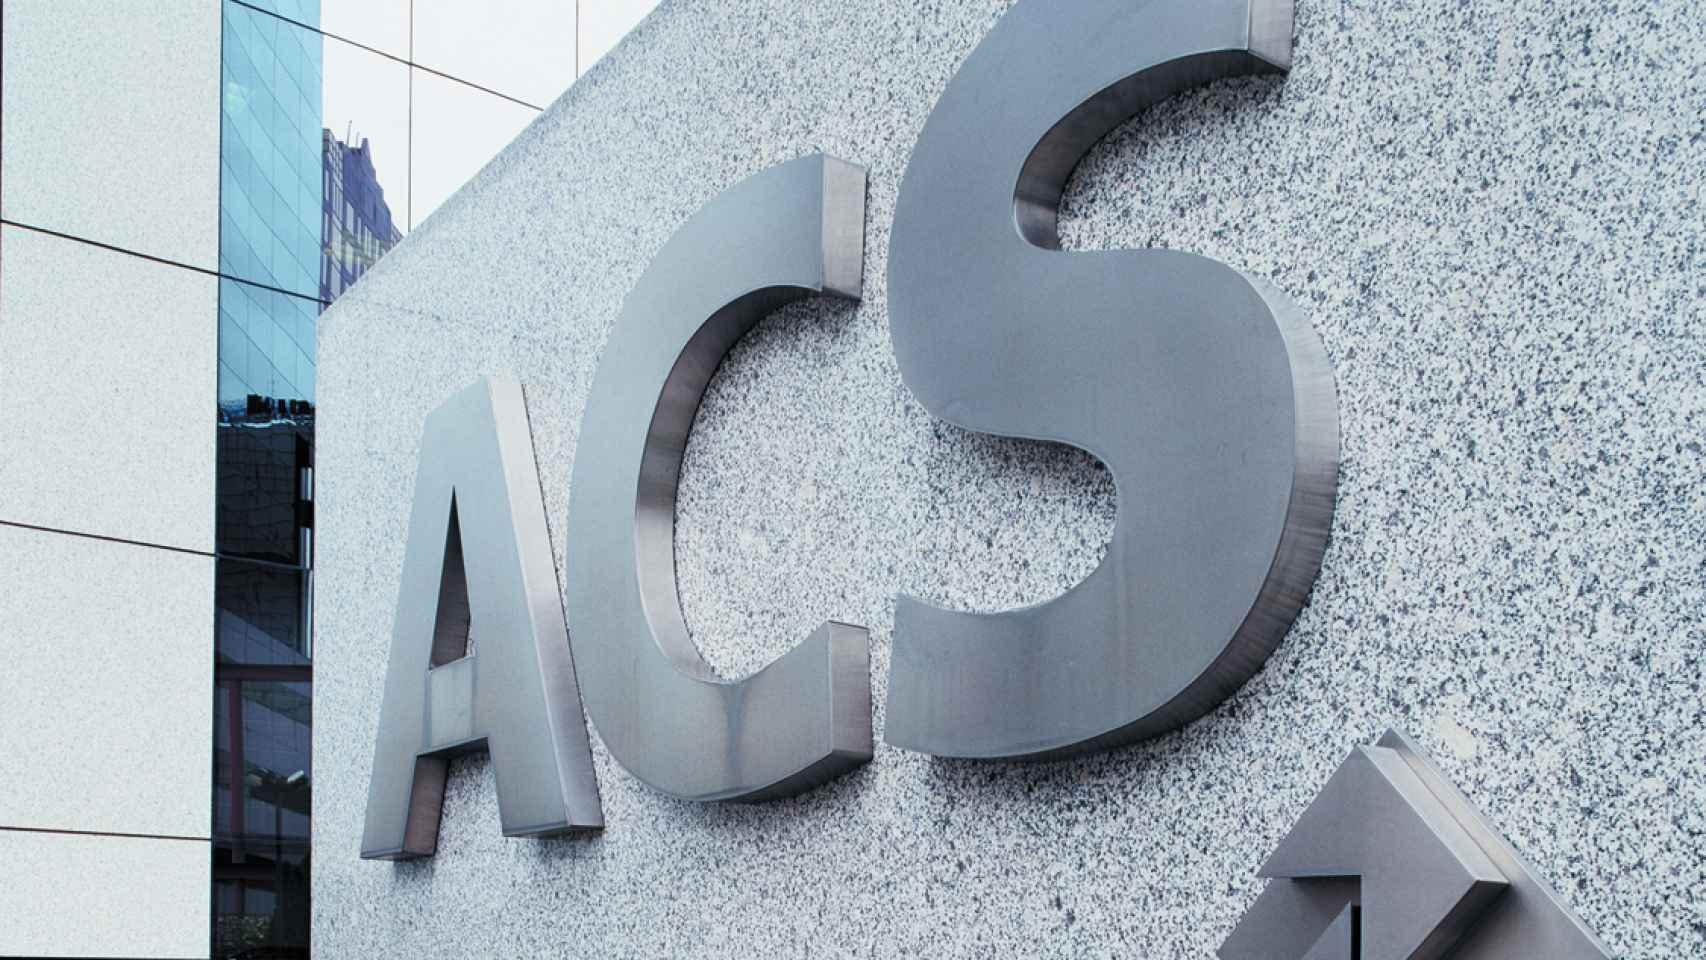 Detalle a la entrada de la sede de ACS.